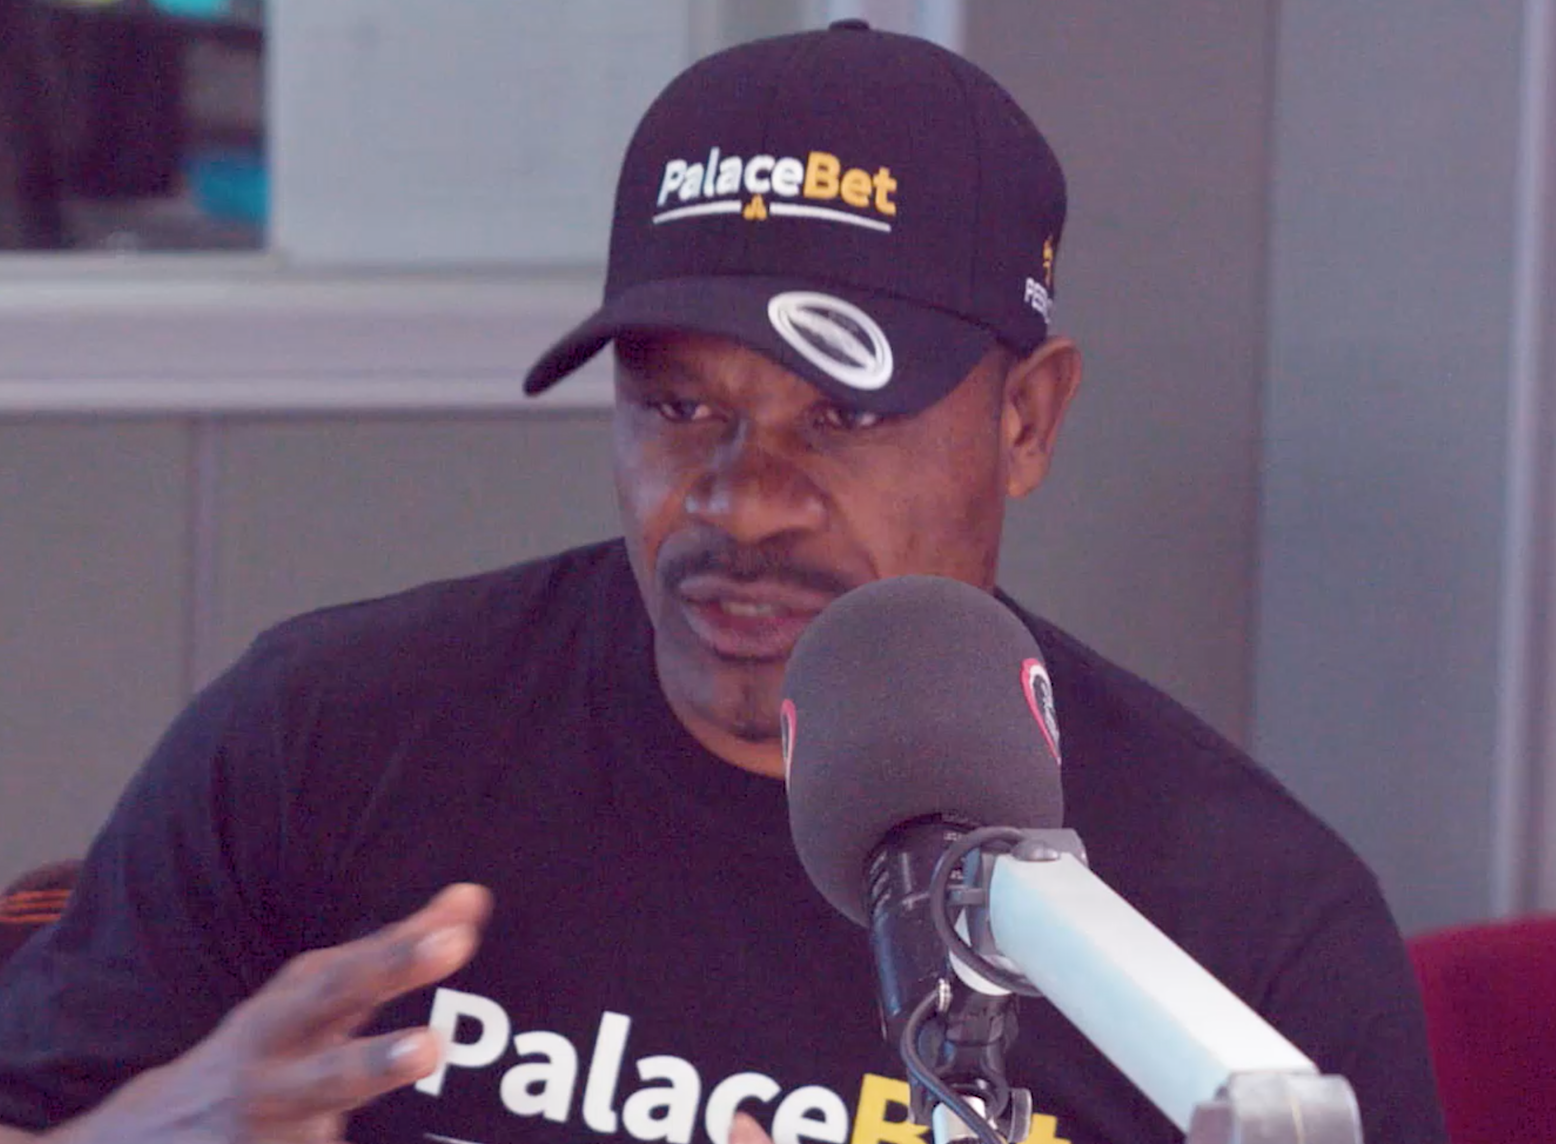 Lucky Lekgwathi recounts fond memories as a Bafana Bafana player